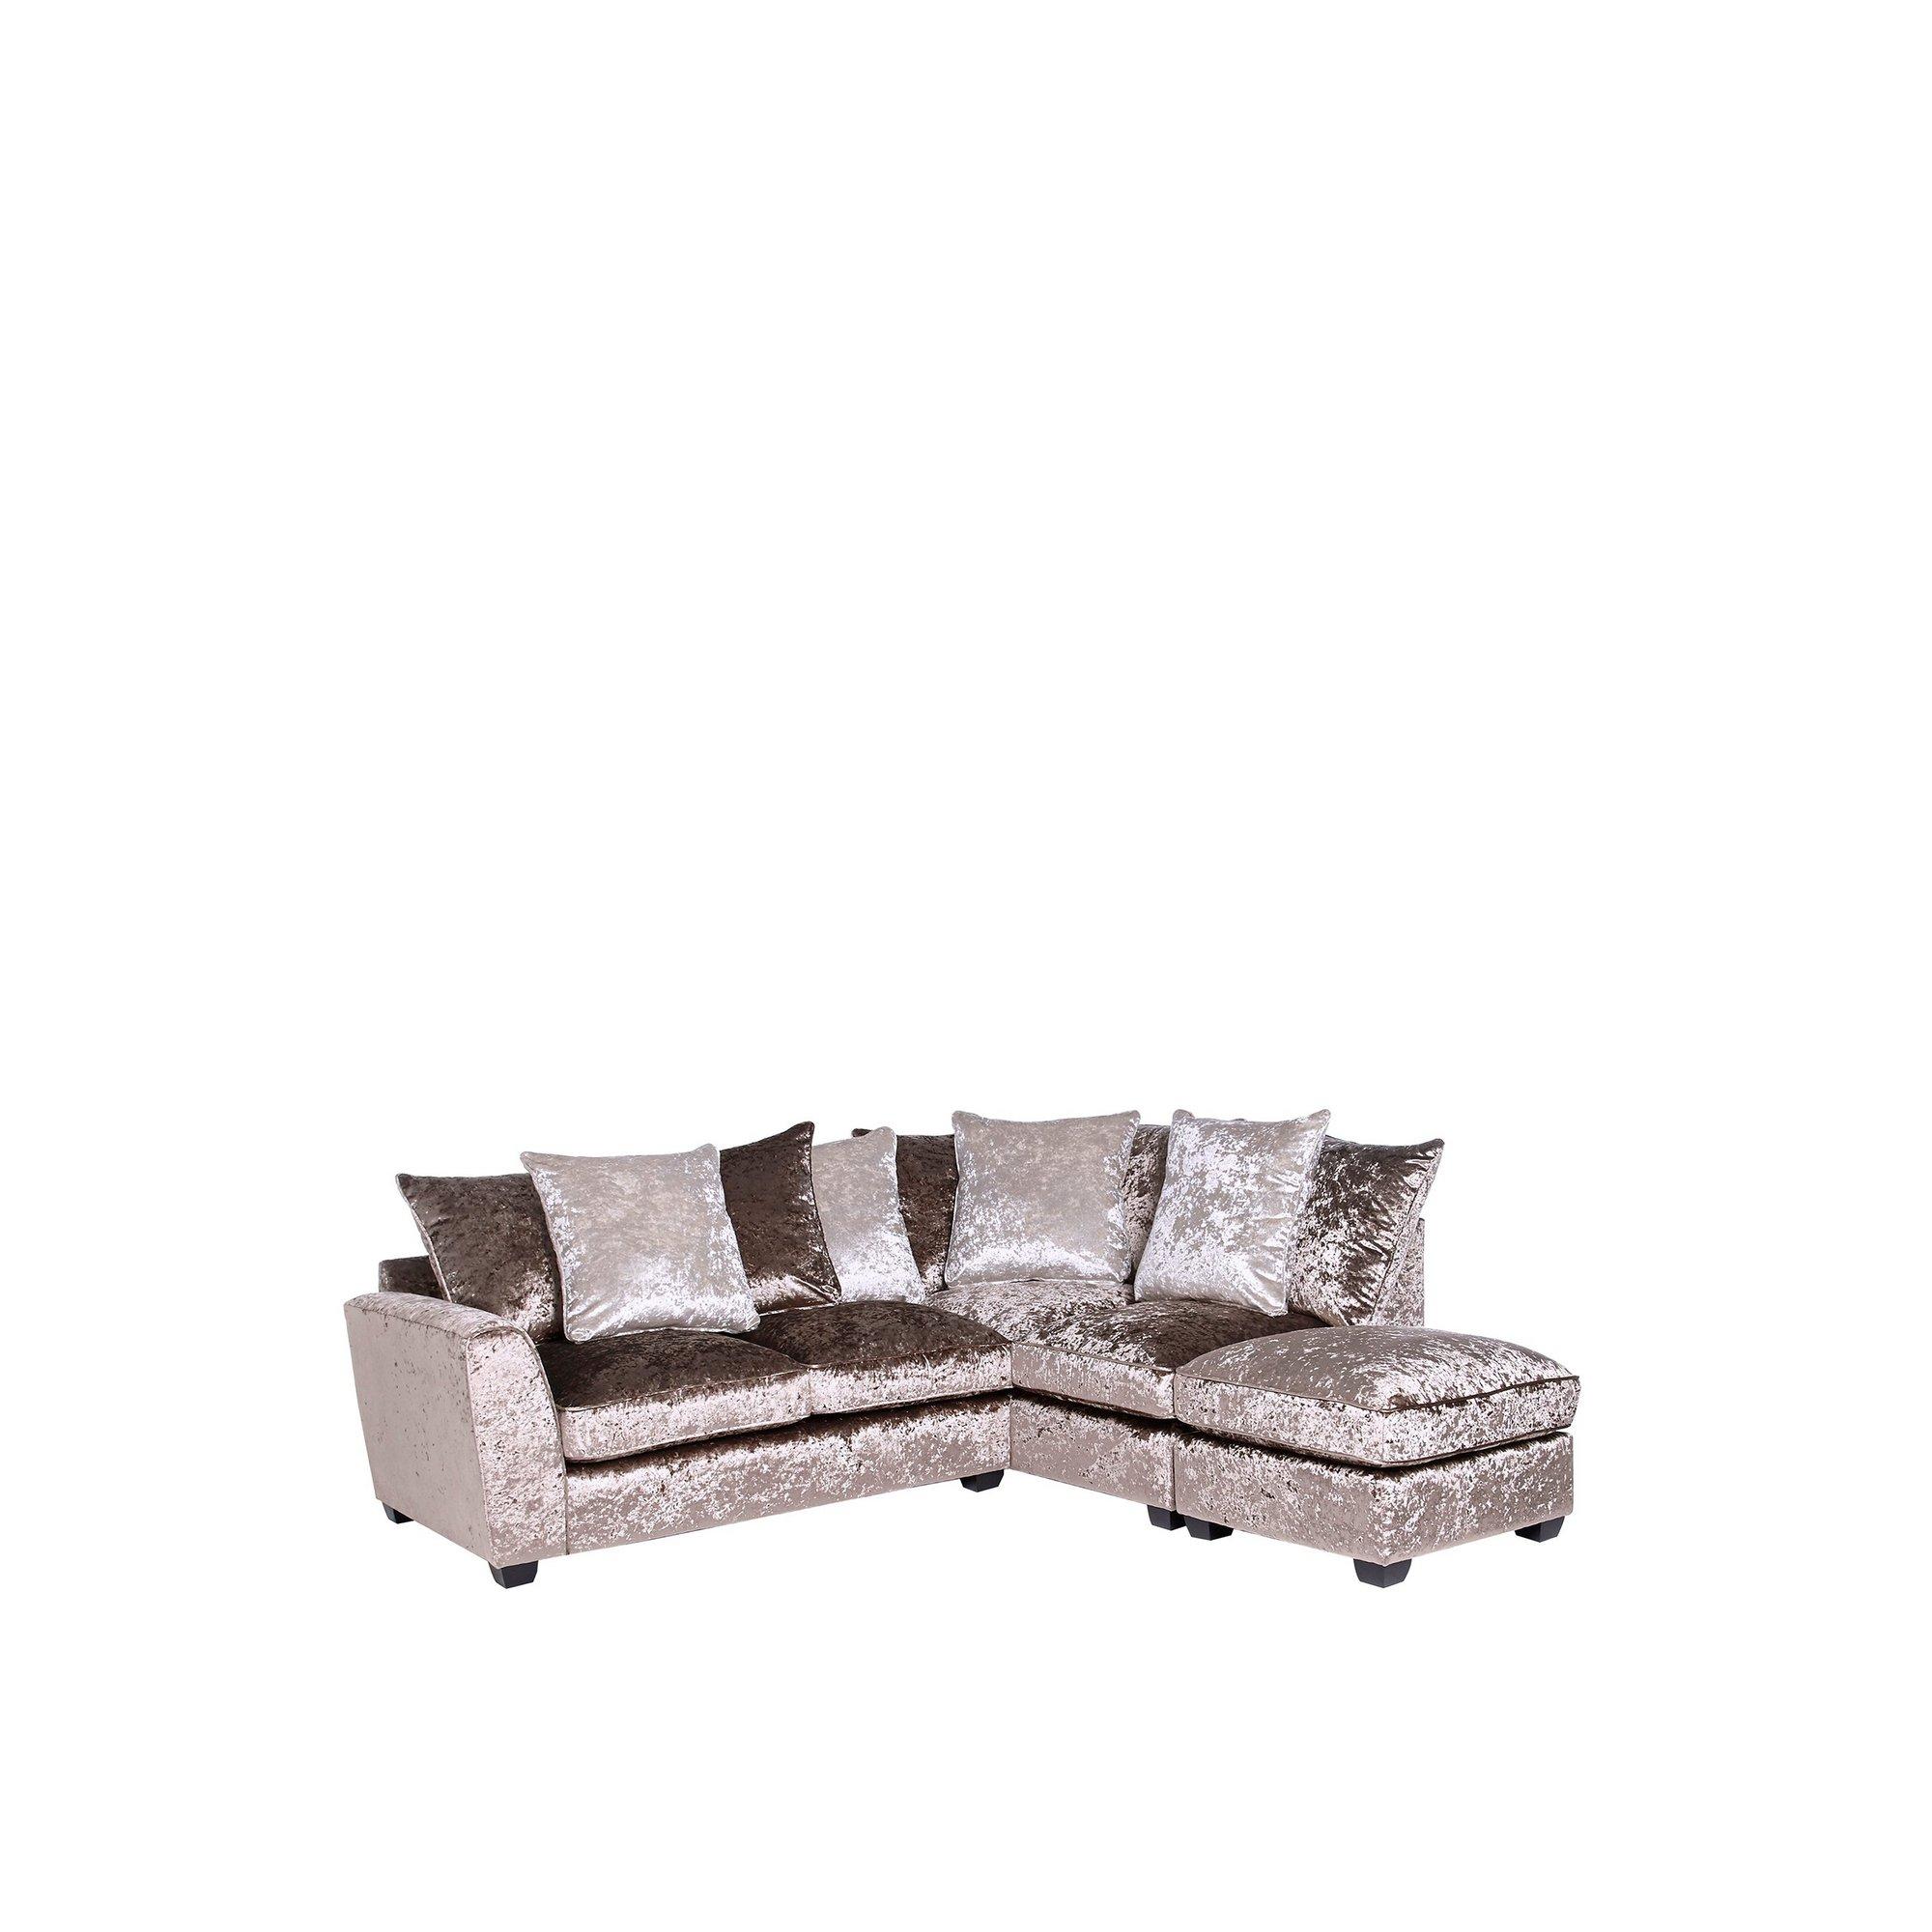 Image of Akira Right Corner Group Sofa